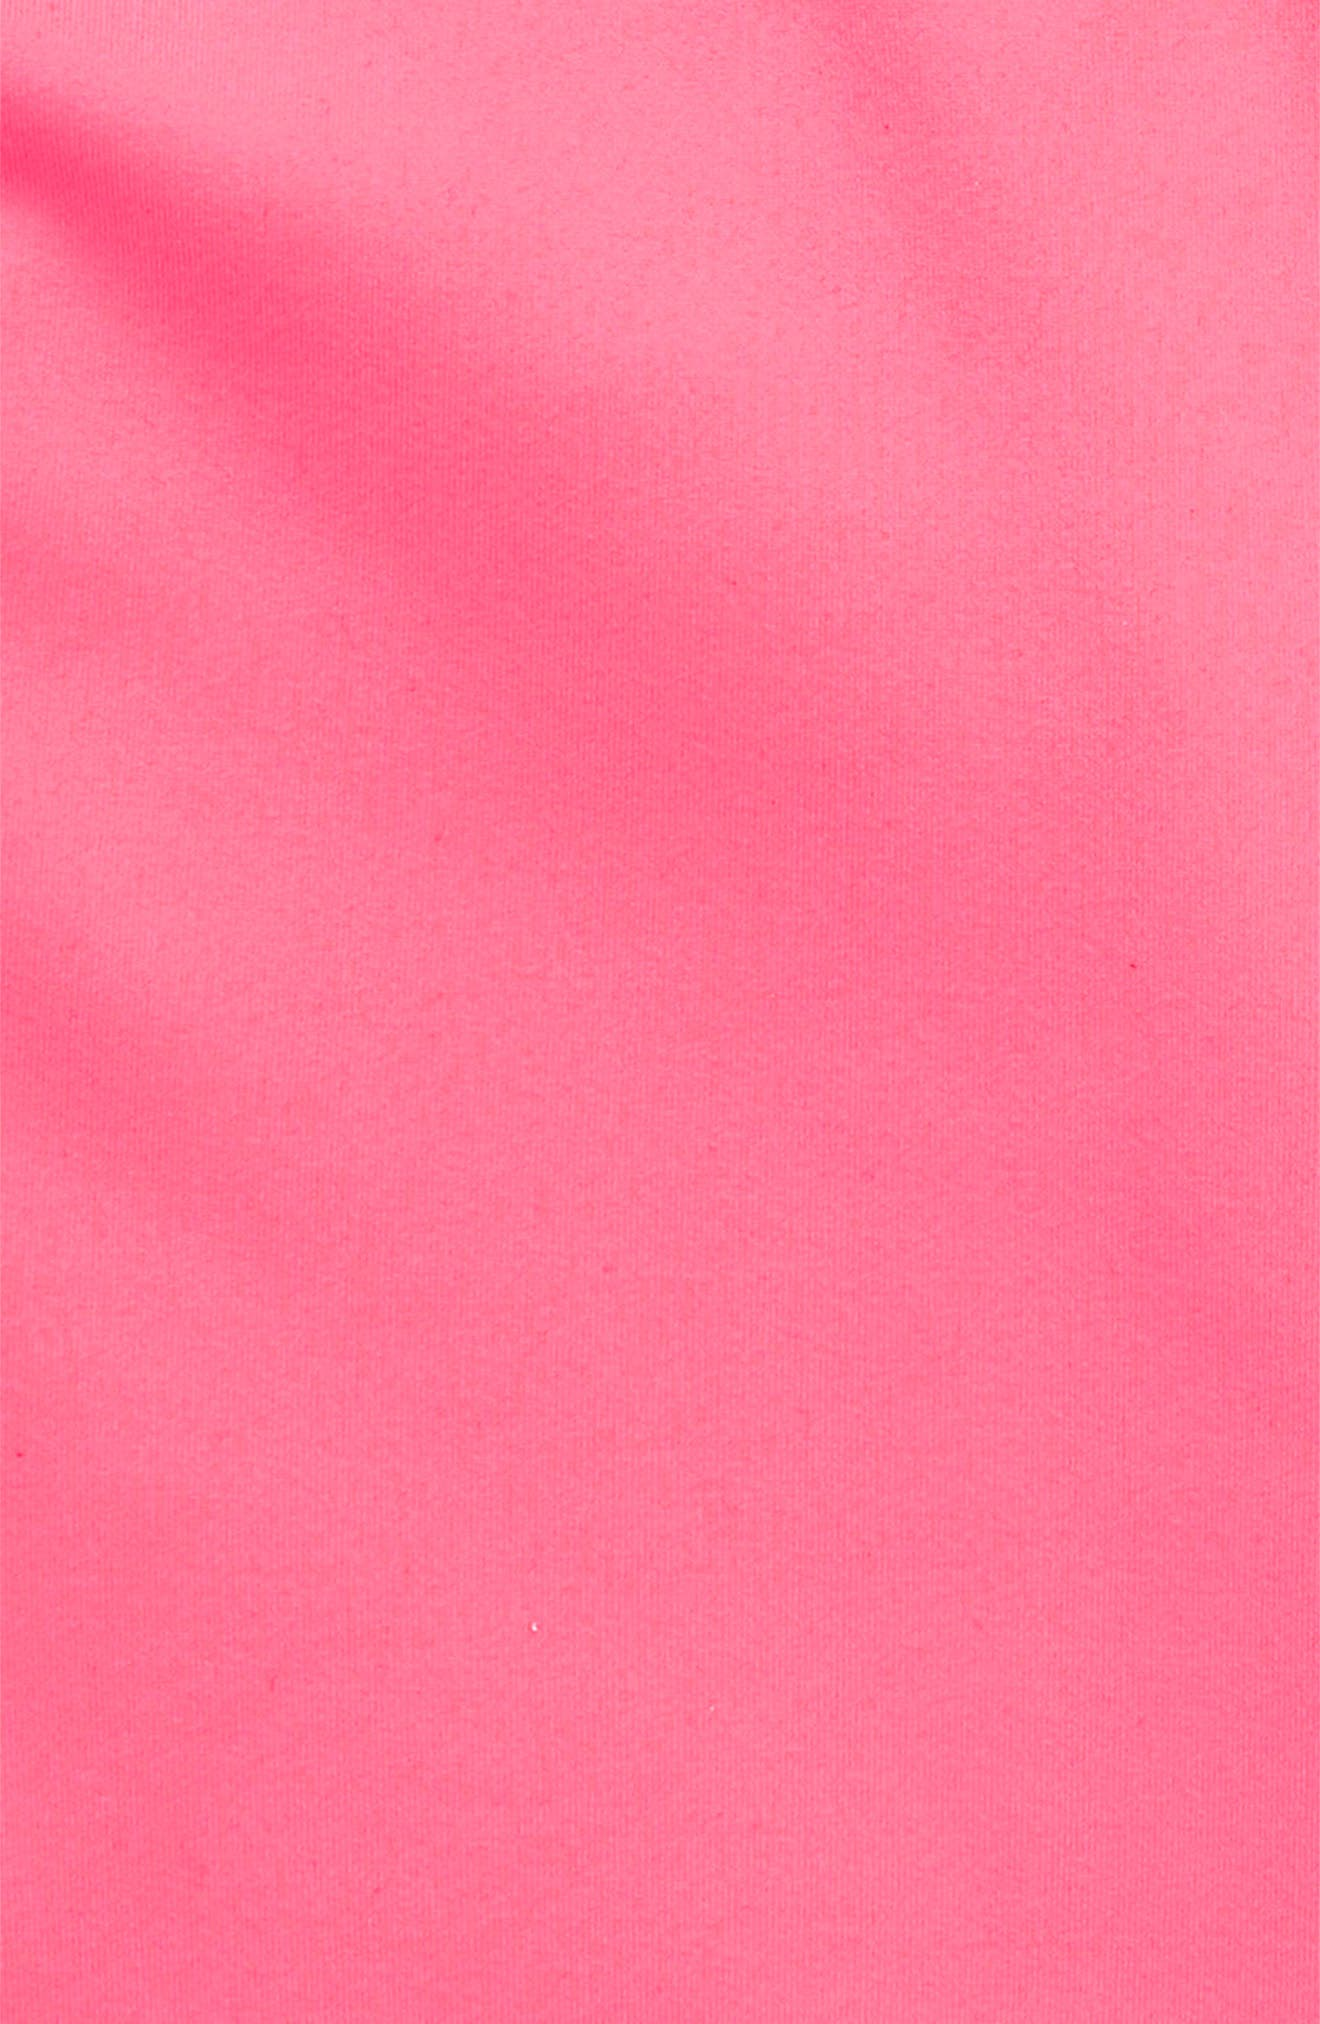 Husky Power Racerback Tank,                             Alternate thumbnail 3, color,                             Pink